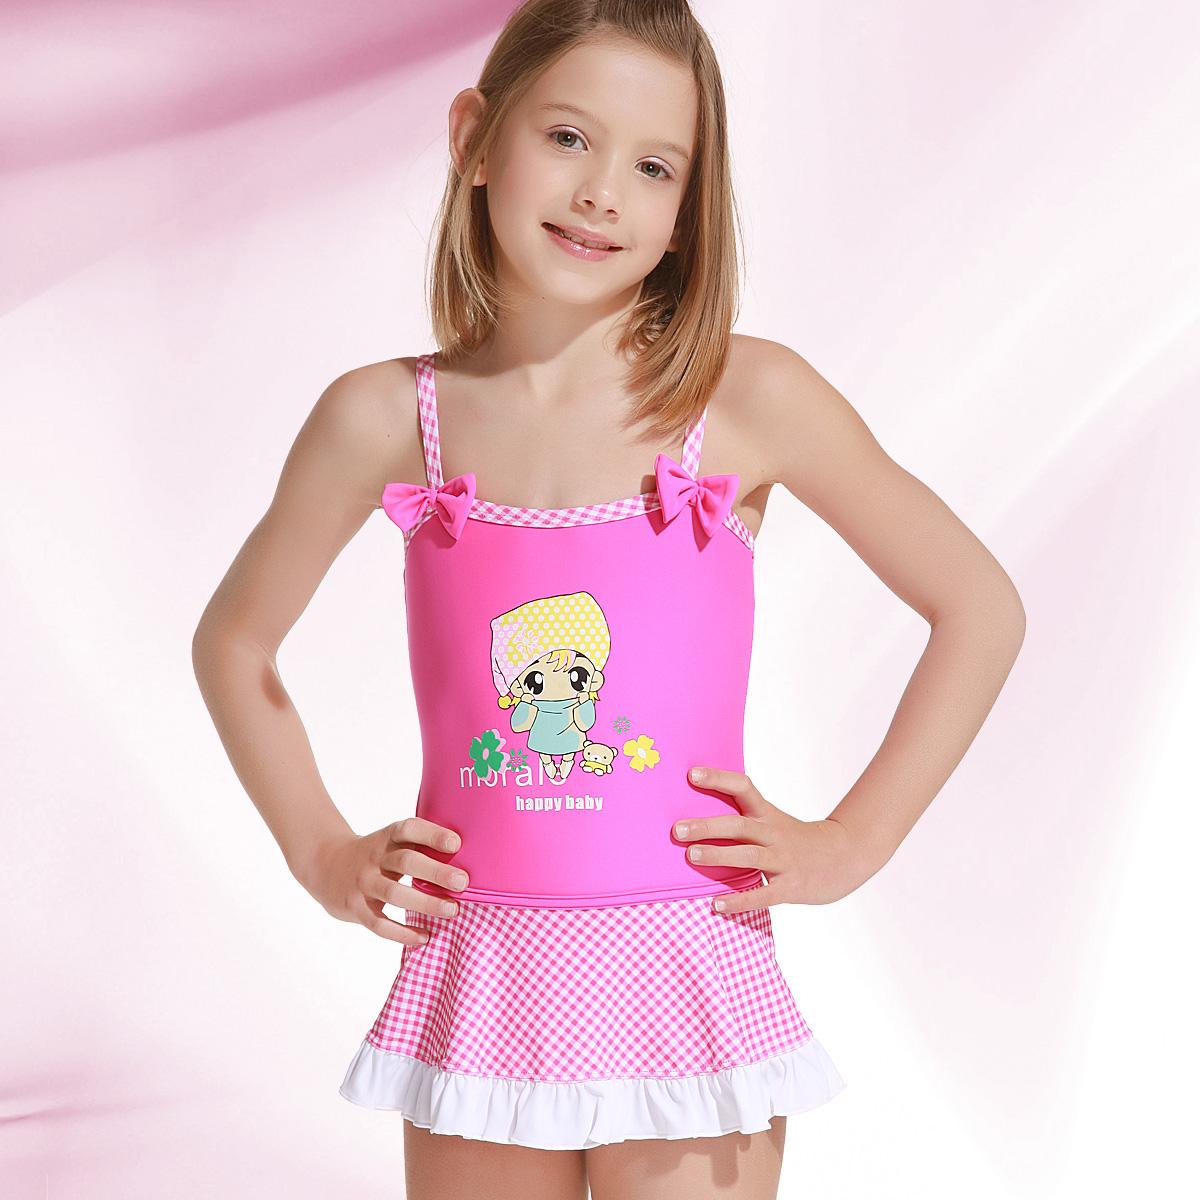 Little girls in skirts Photo 6